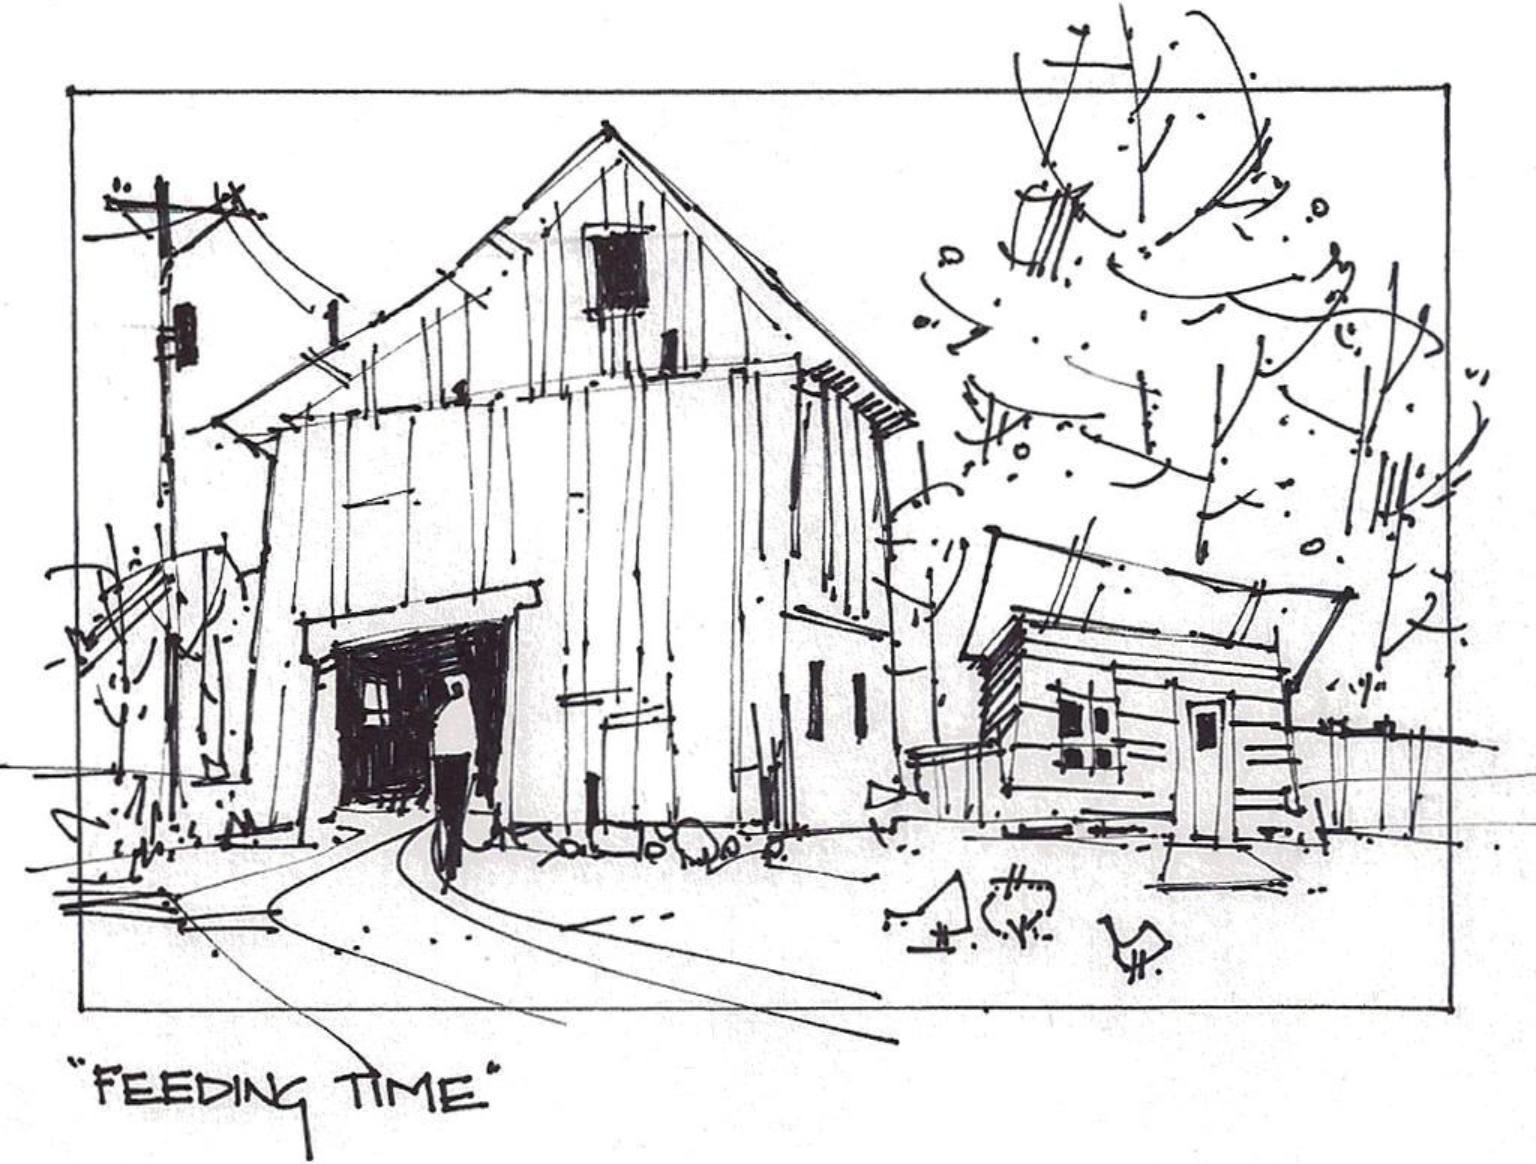 Pin By Tony Zarak On Urban Sketching